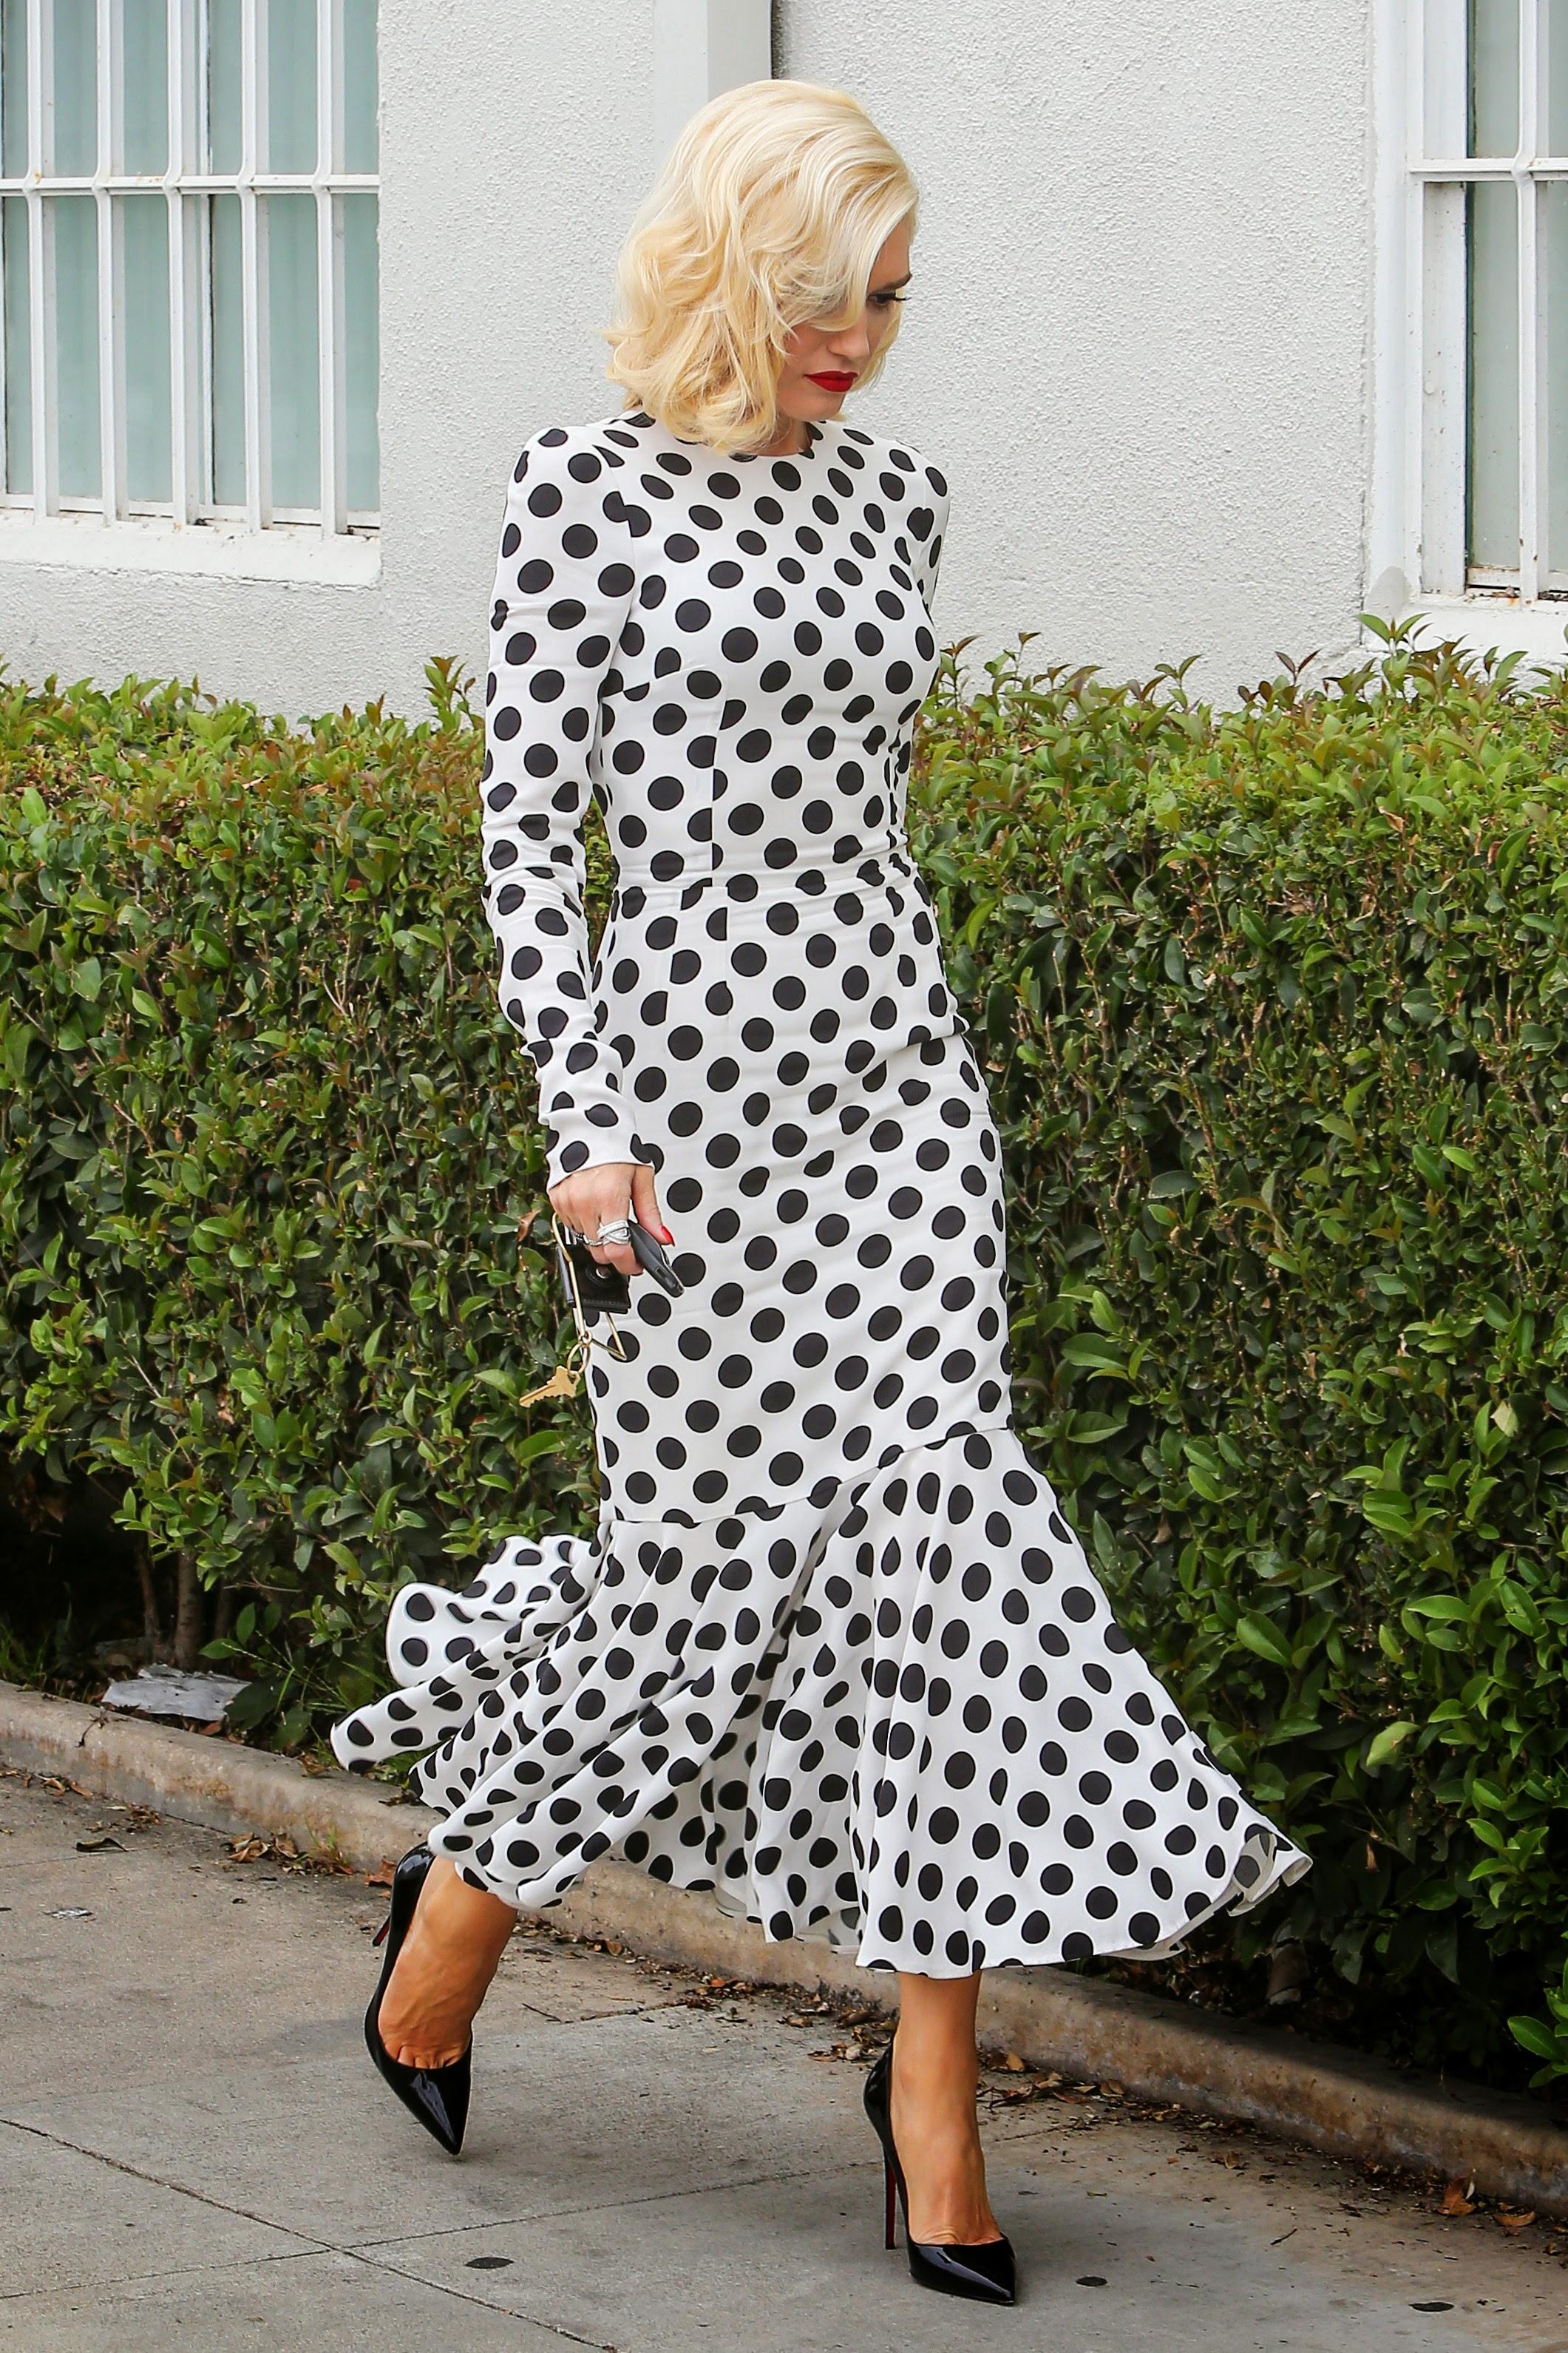 Toe Cleavage Blondes In Black & White - Gwen Stefani